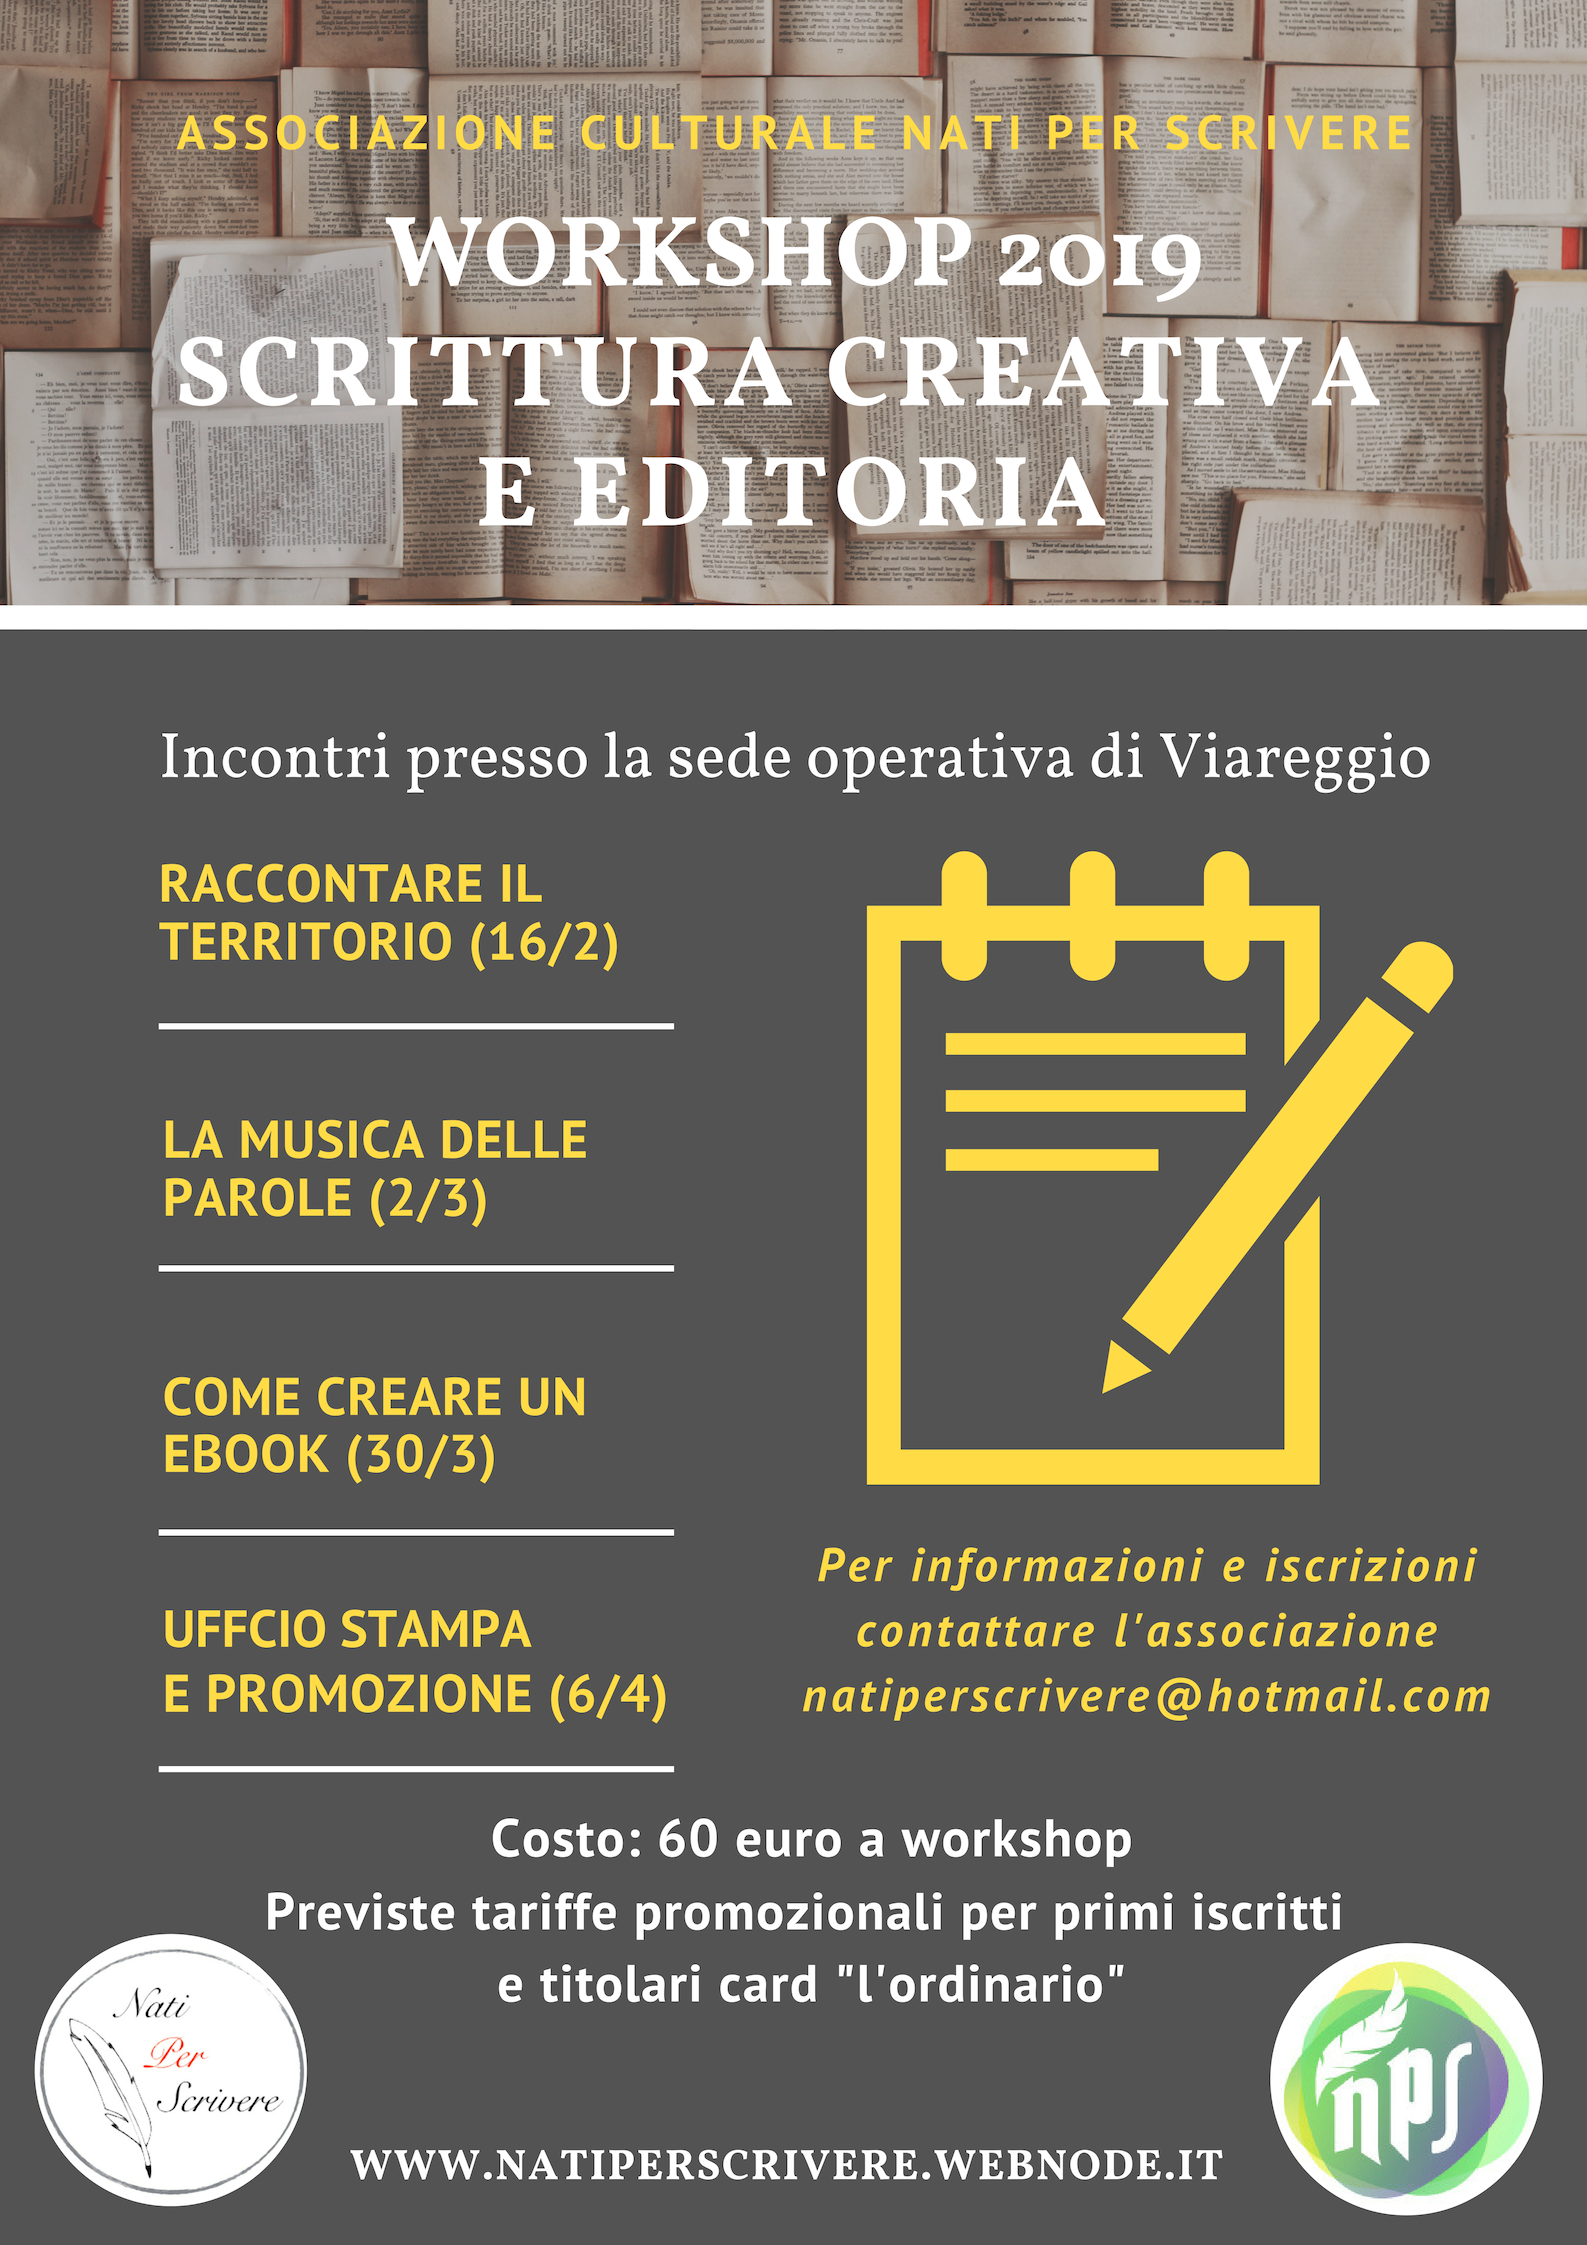 Workshop 2019 @ Sede operativa NPS, Viareggio